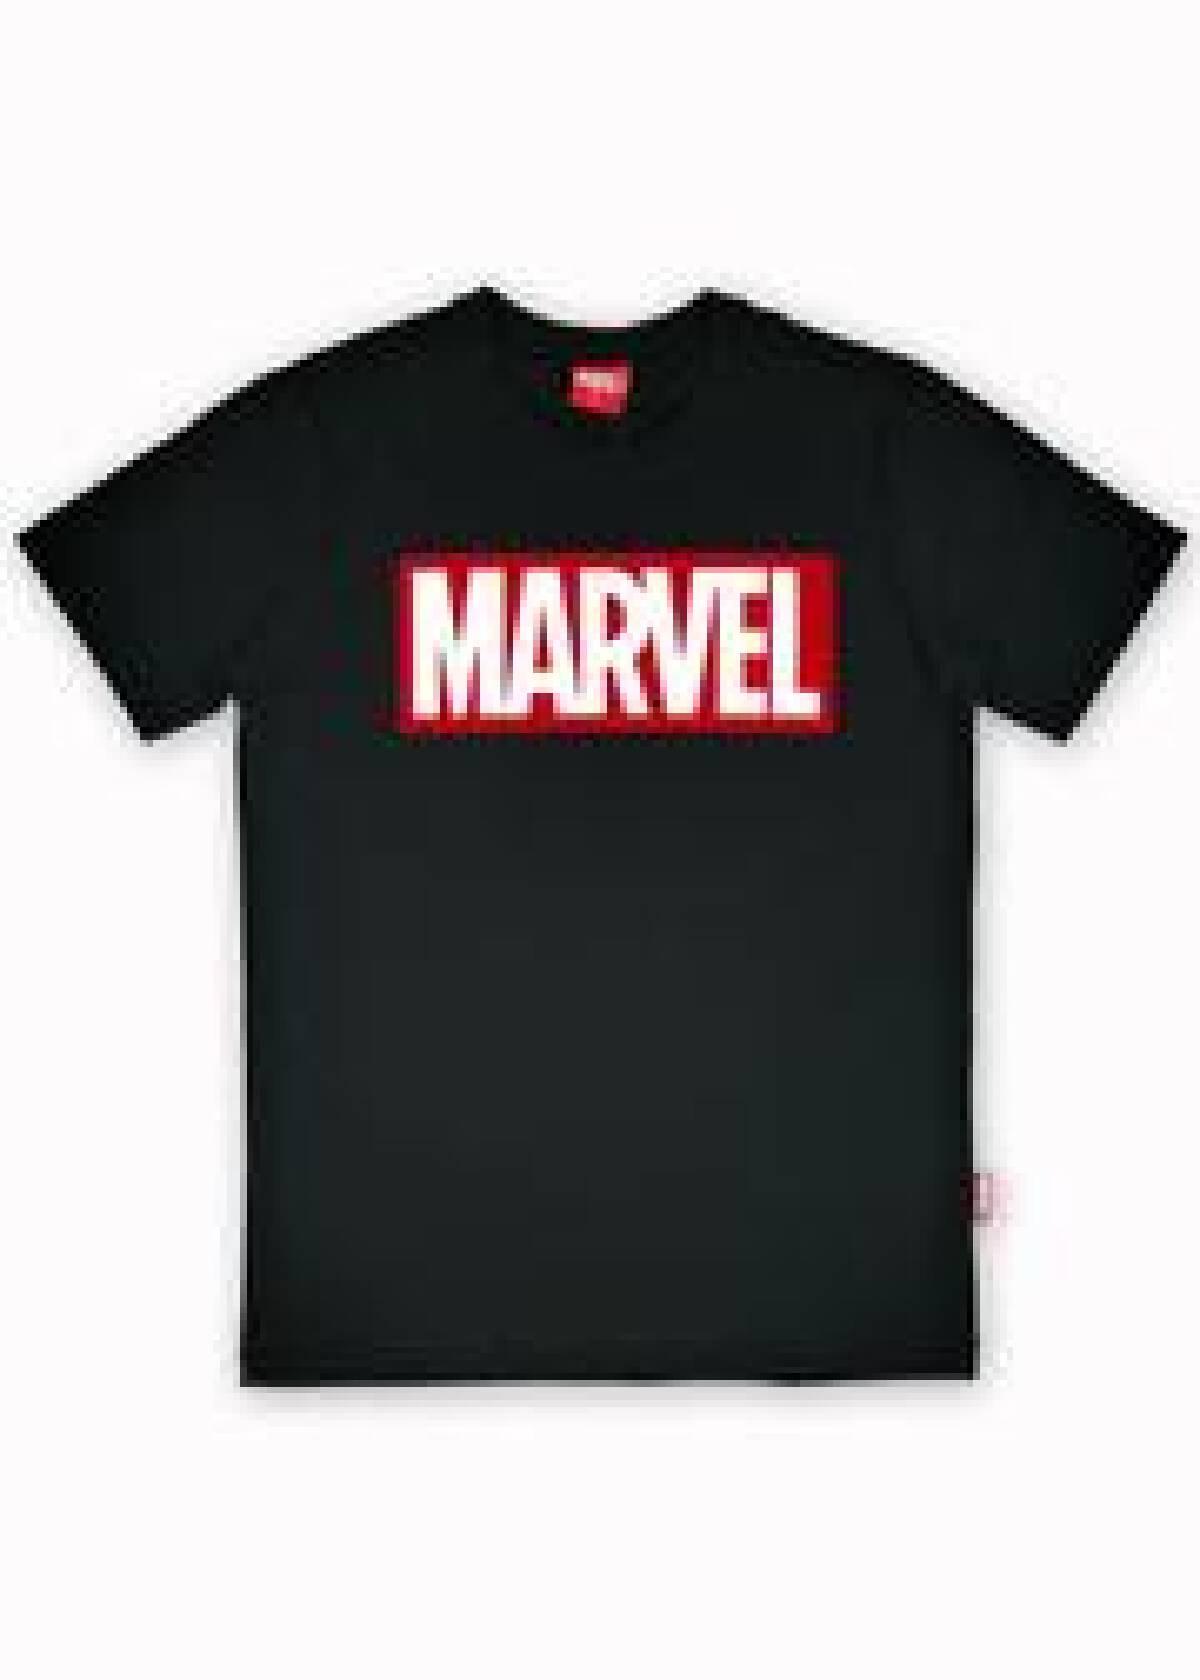 Eighty years of Marvel magic